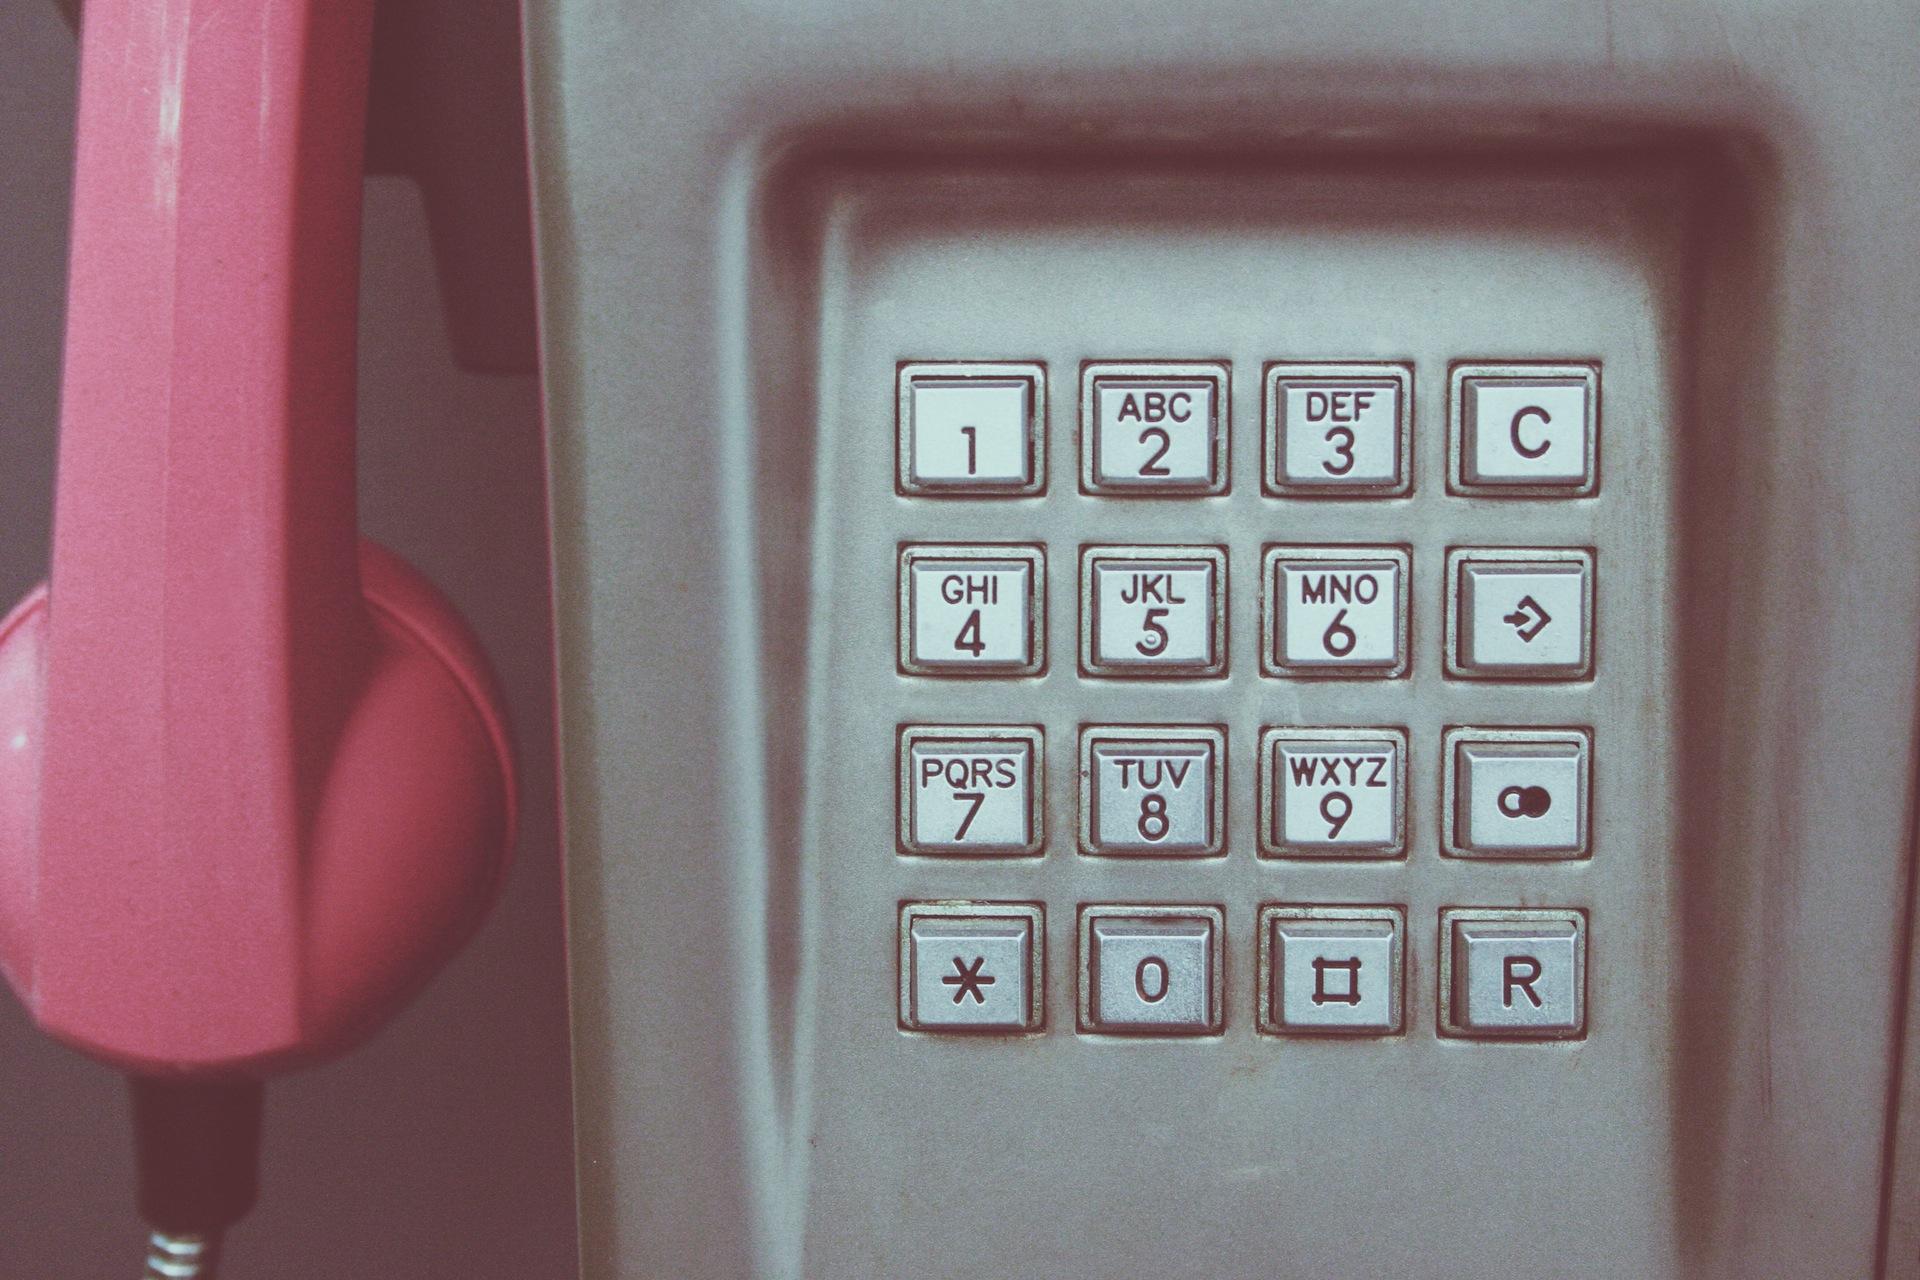 telefono, cabina, chiavi, numeri, vintage, retrò, cabina telefonica - Sfondi HD - Professor-falken.com